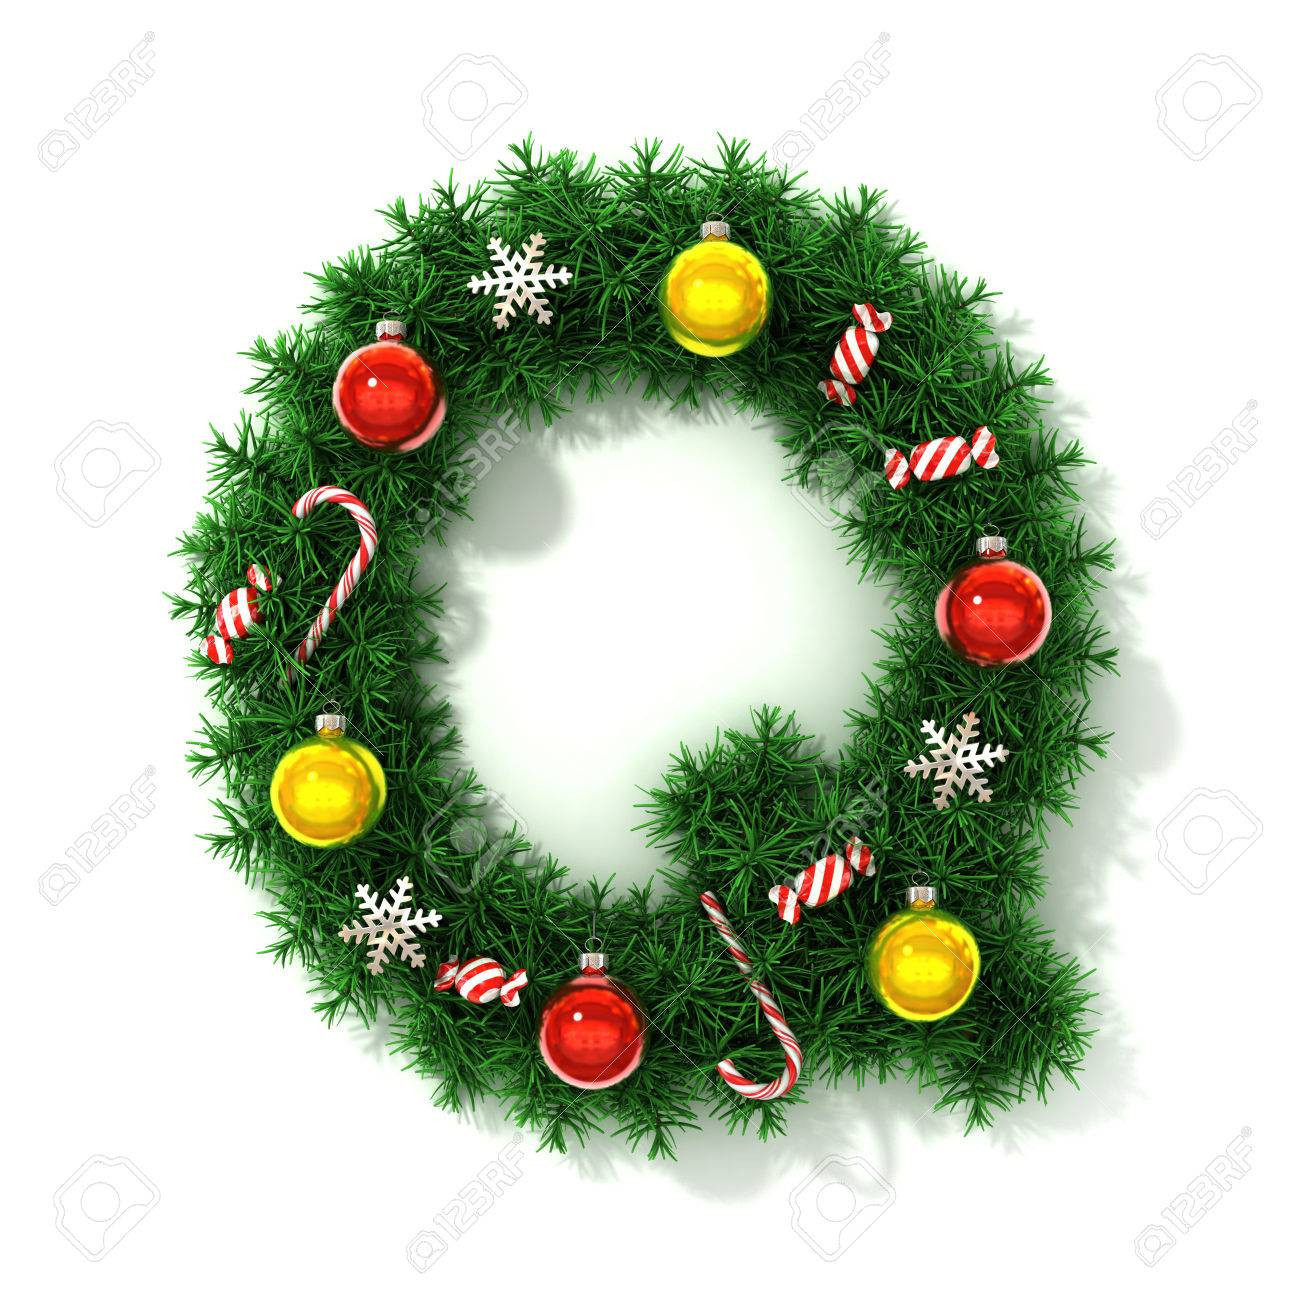 Christmas font letter Q Stock Photo - 40016217